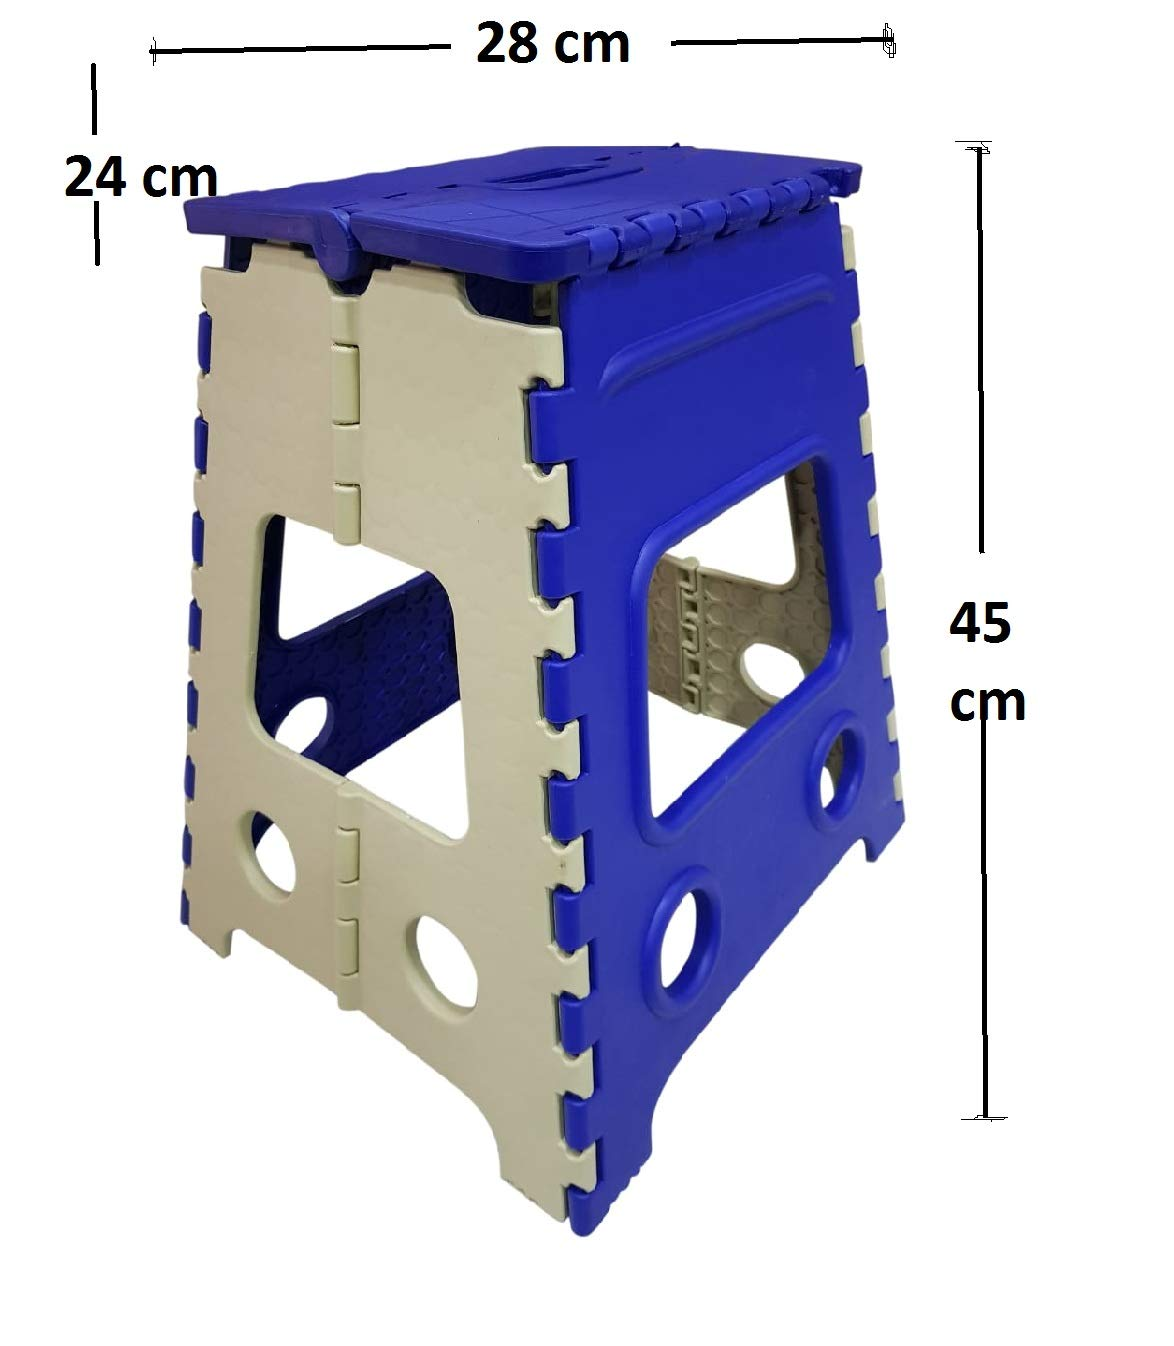 Outstanding Buy 18 Inch Folding Step Stool Plastic Multi Purpose Step Frankydiablos Diy Chair Ideas Frankydiabloscom